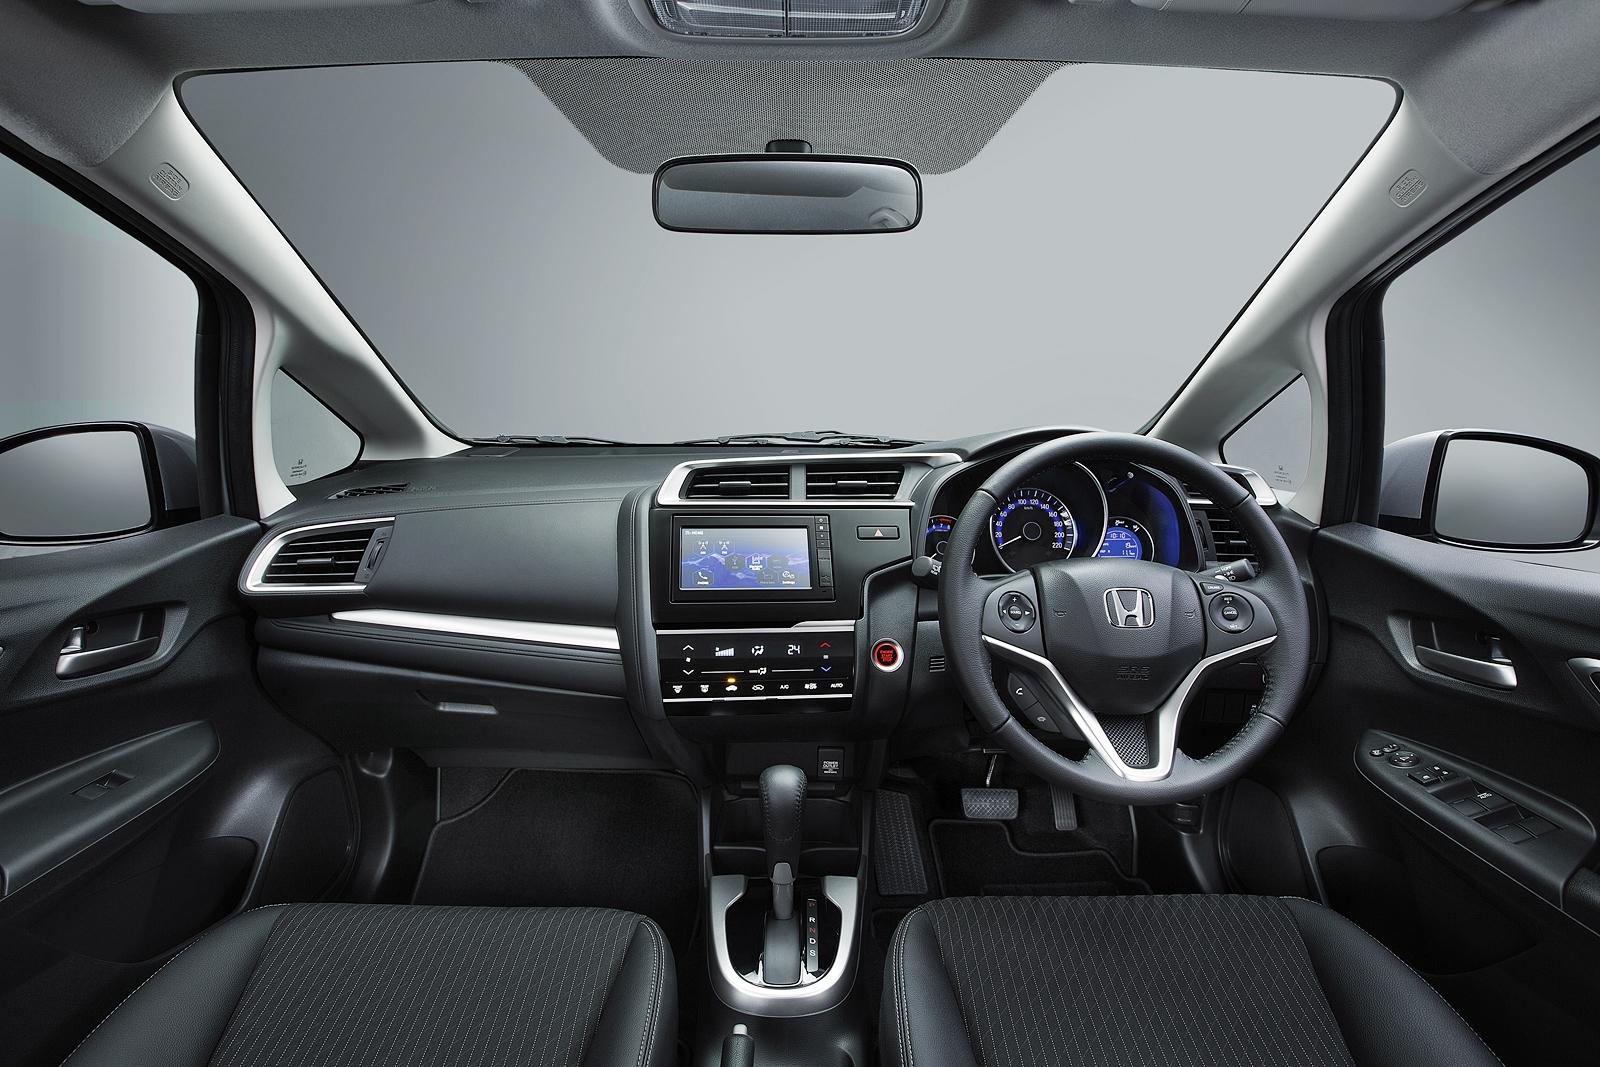 930 Gambar Mobil Honda Jazz Merah Terbaru HD Terbaik